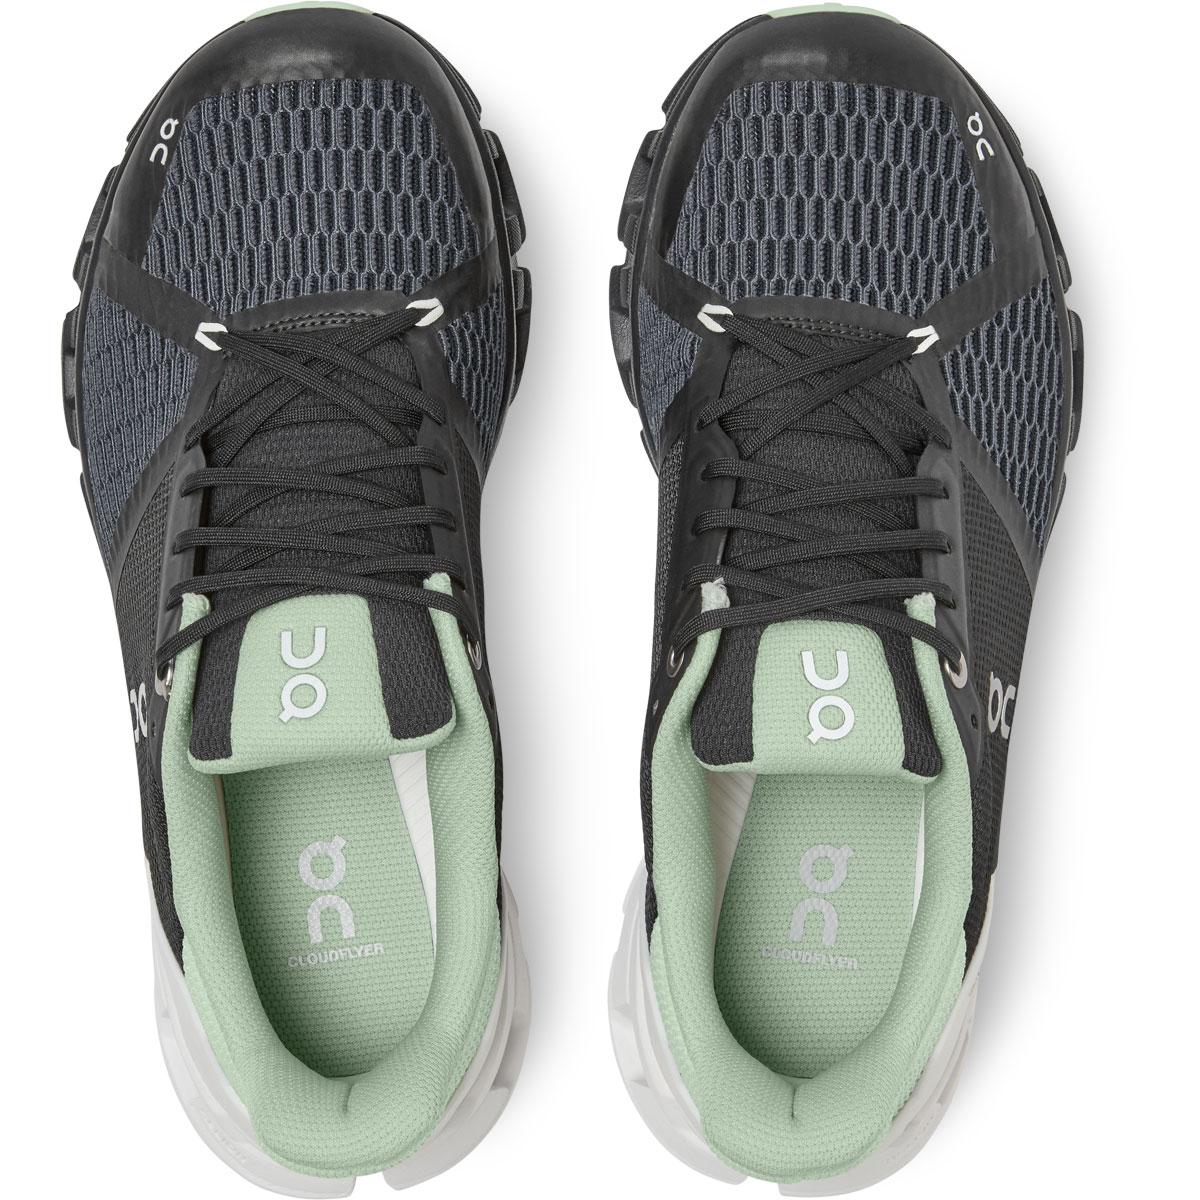 Women's On Cloudflyer 2.0 Running Shoe - Color: Black/White - Size: 5 - Width: Regular, Black/White, large, image 4